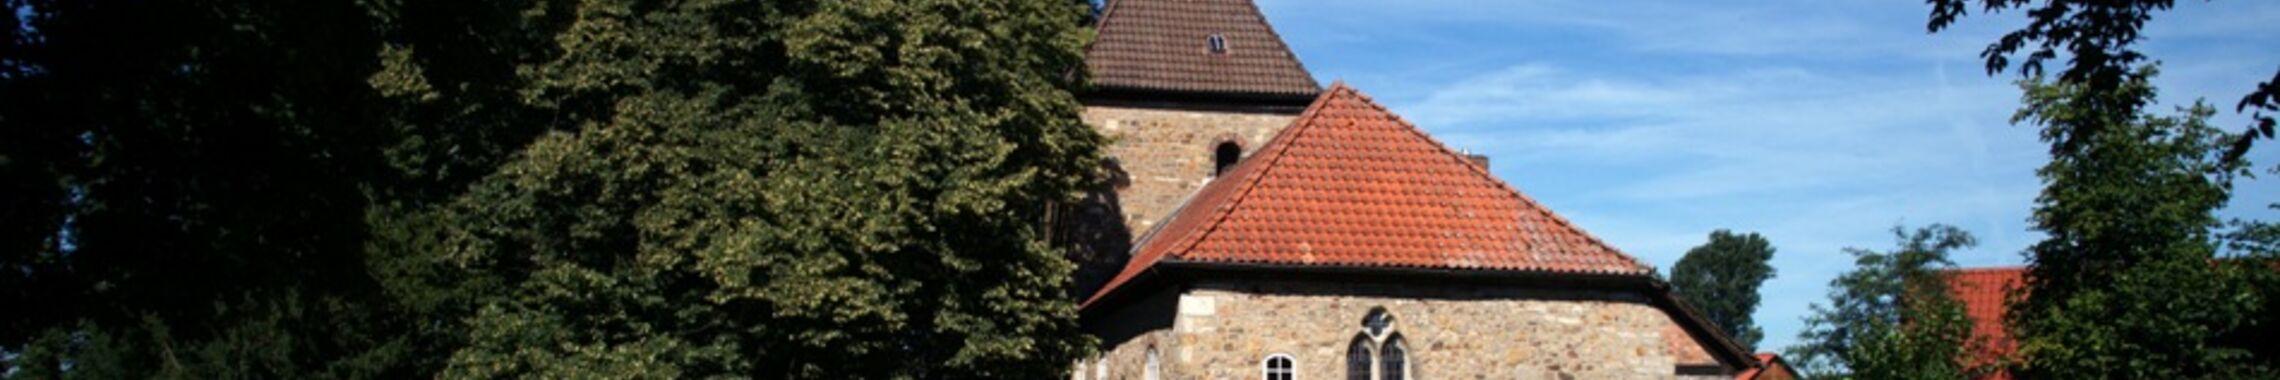 St. Nicolai Hattorf